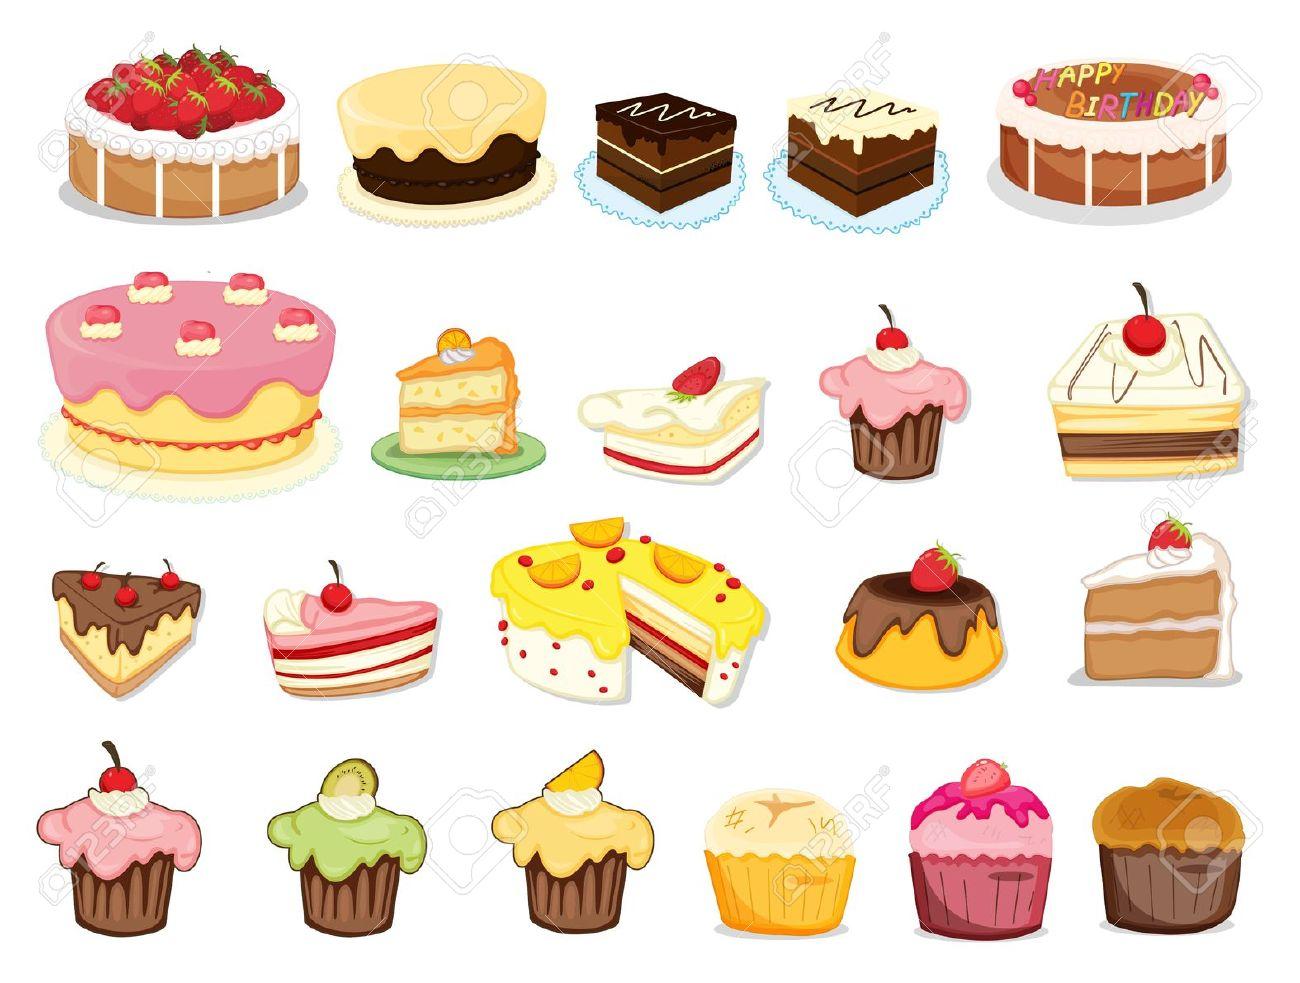 Cake clipart dessert On & clipart Clipart Dessert